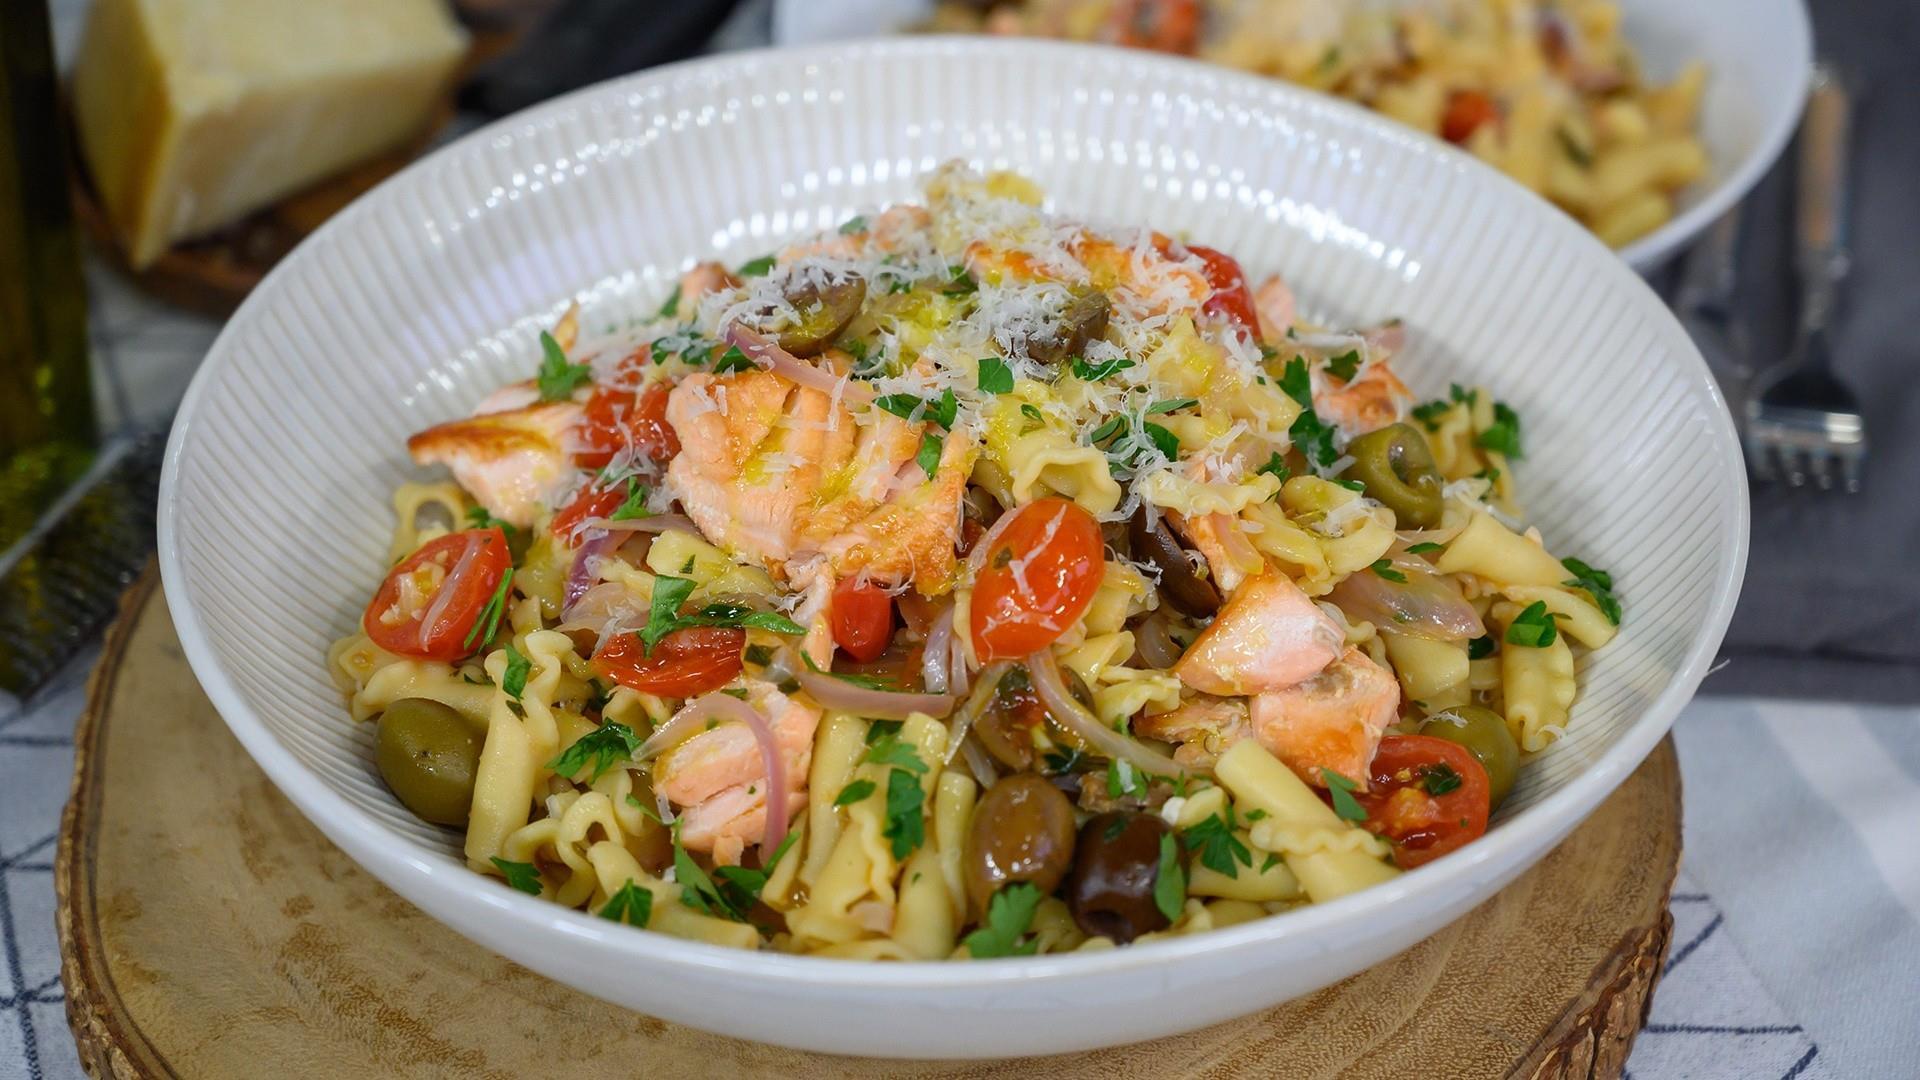 Entertaining recipes: Make Giada's pasta with fresh puttanesca